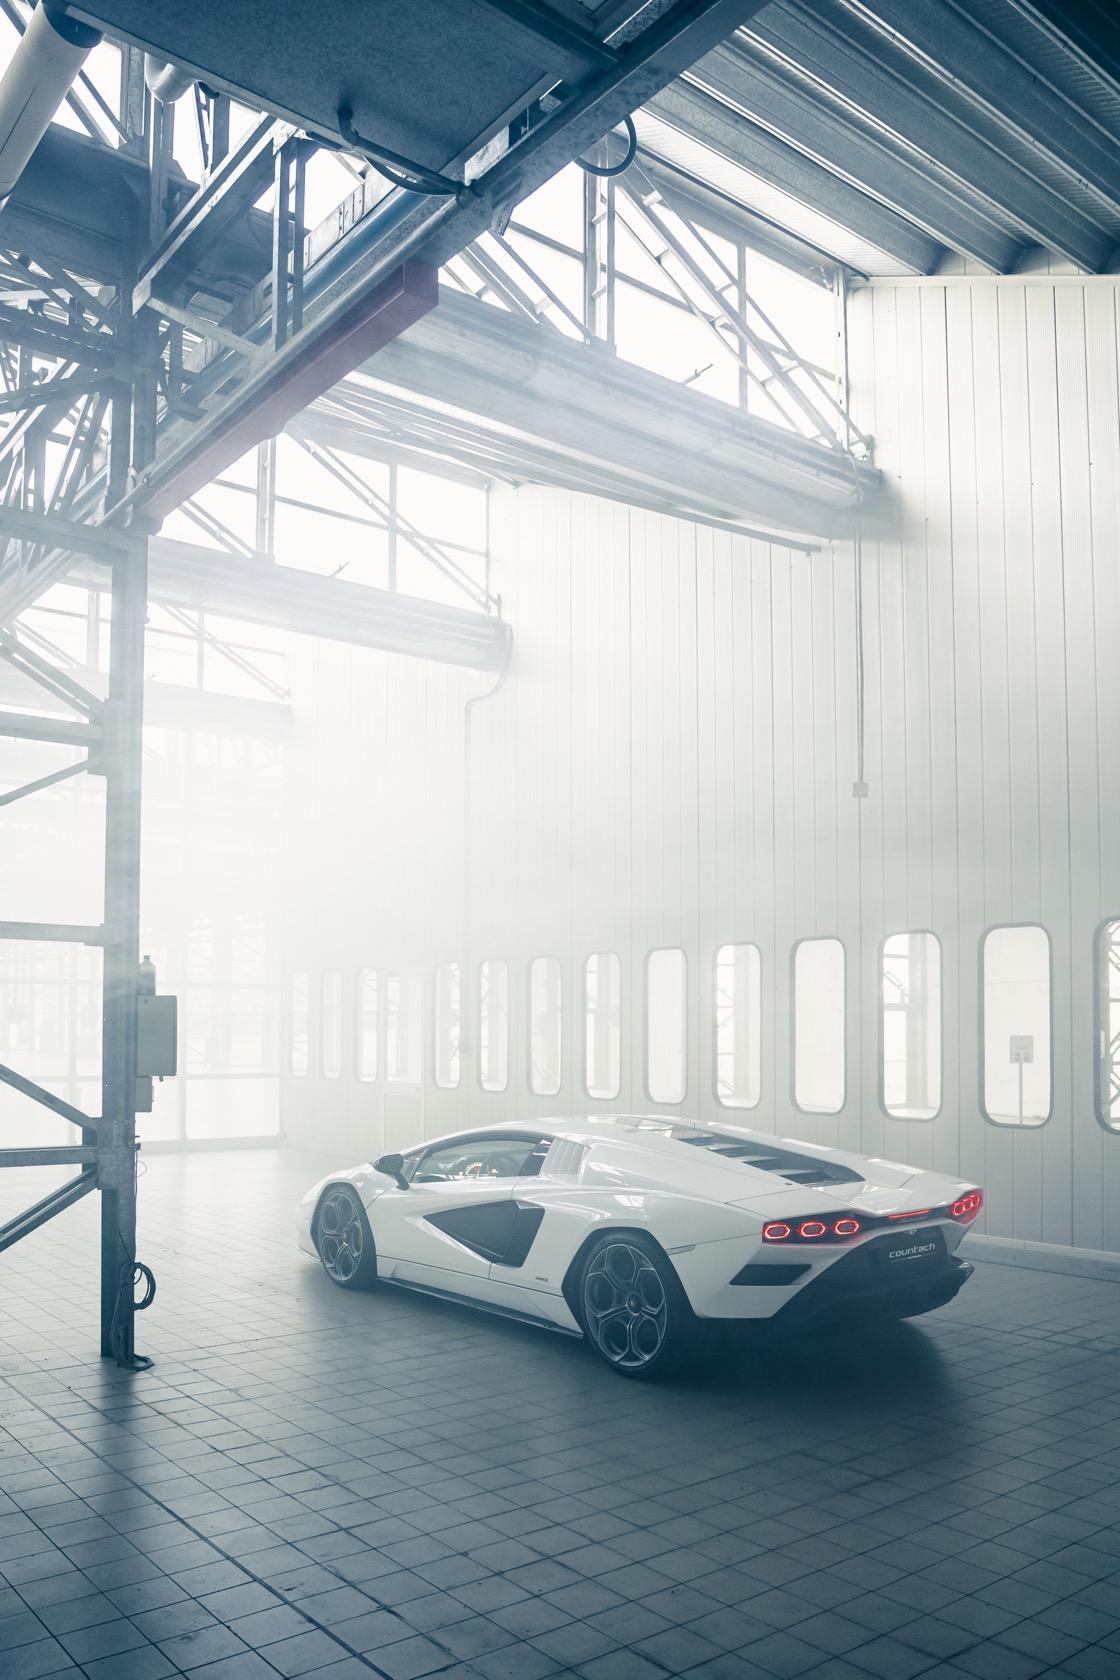 wonderful model Lamborghini Countach Lpi 800